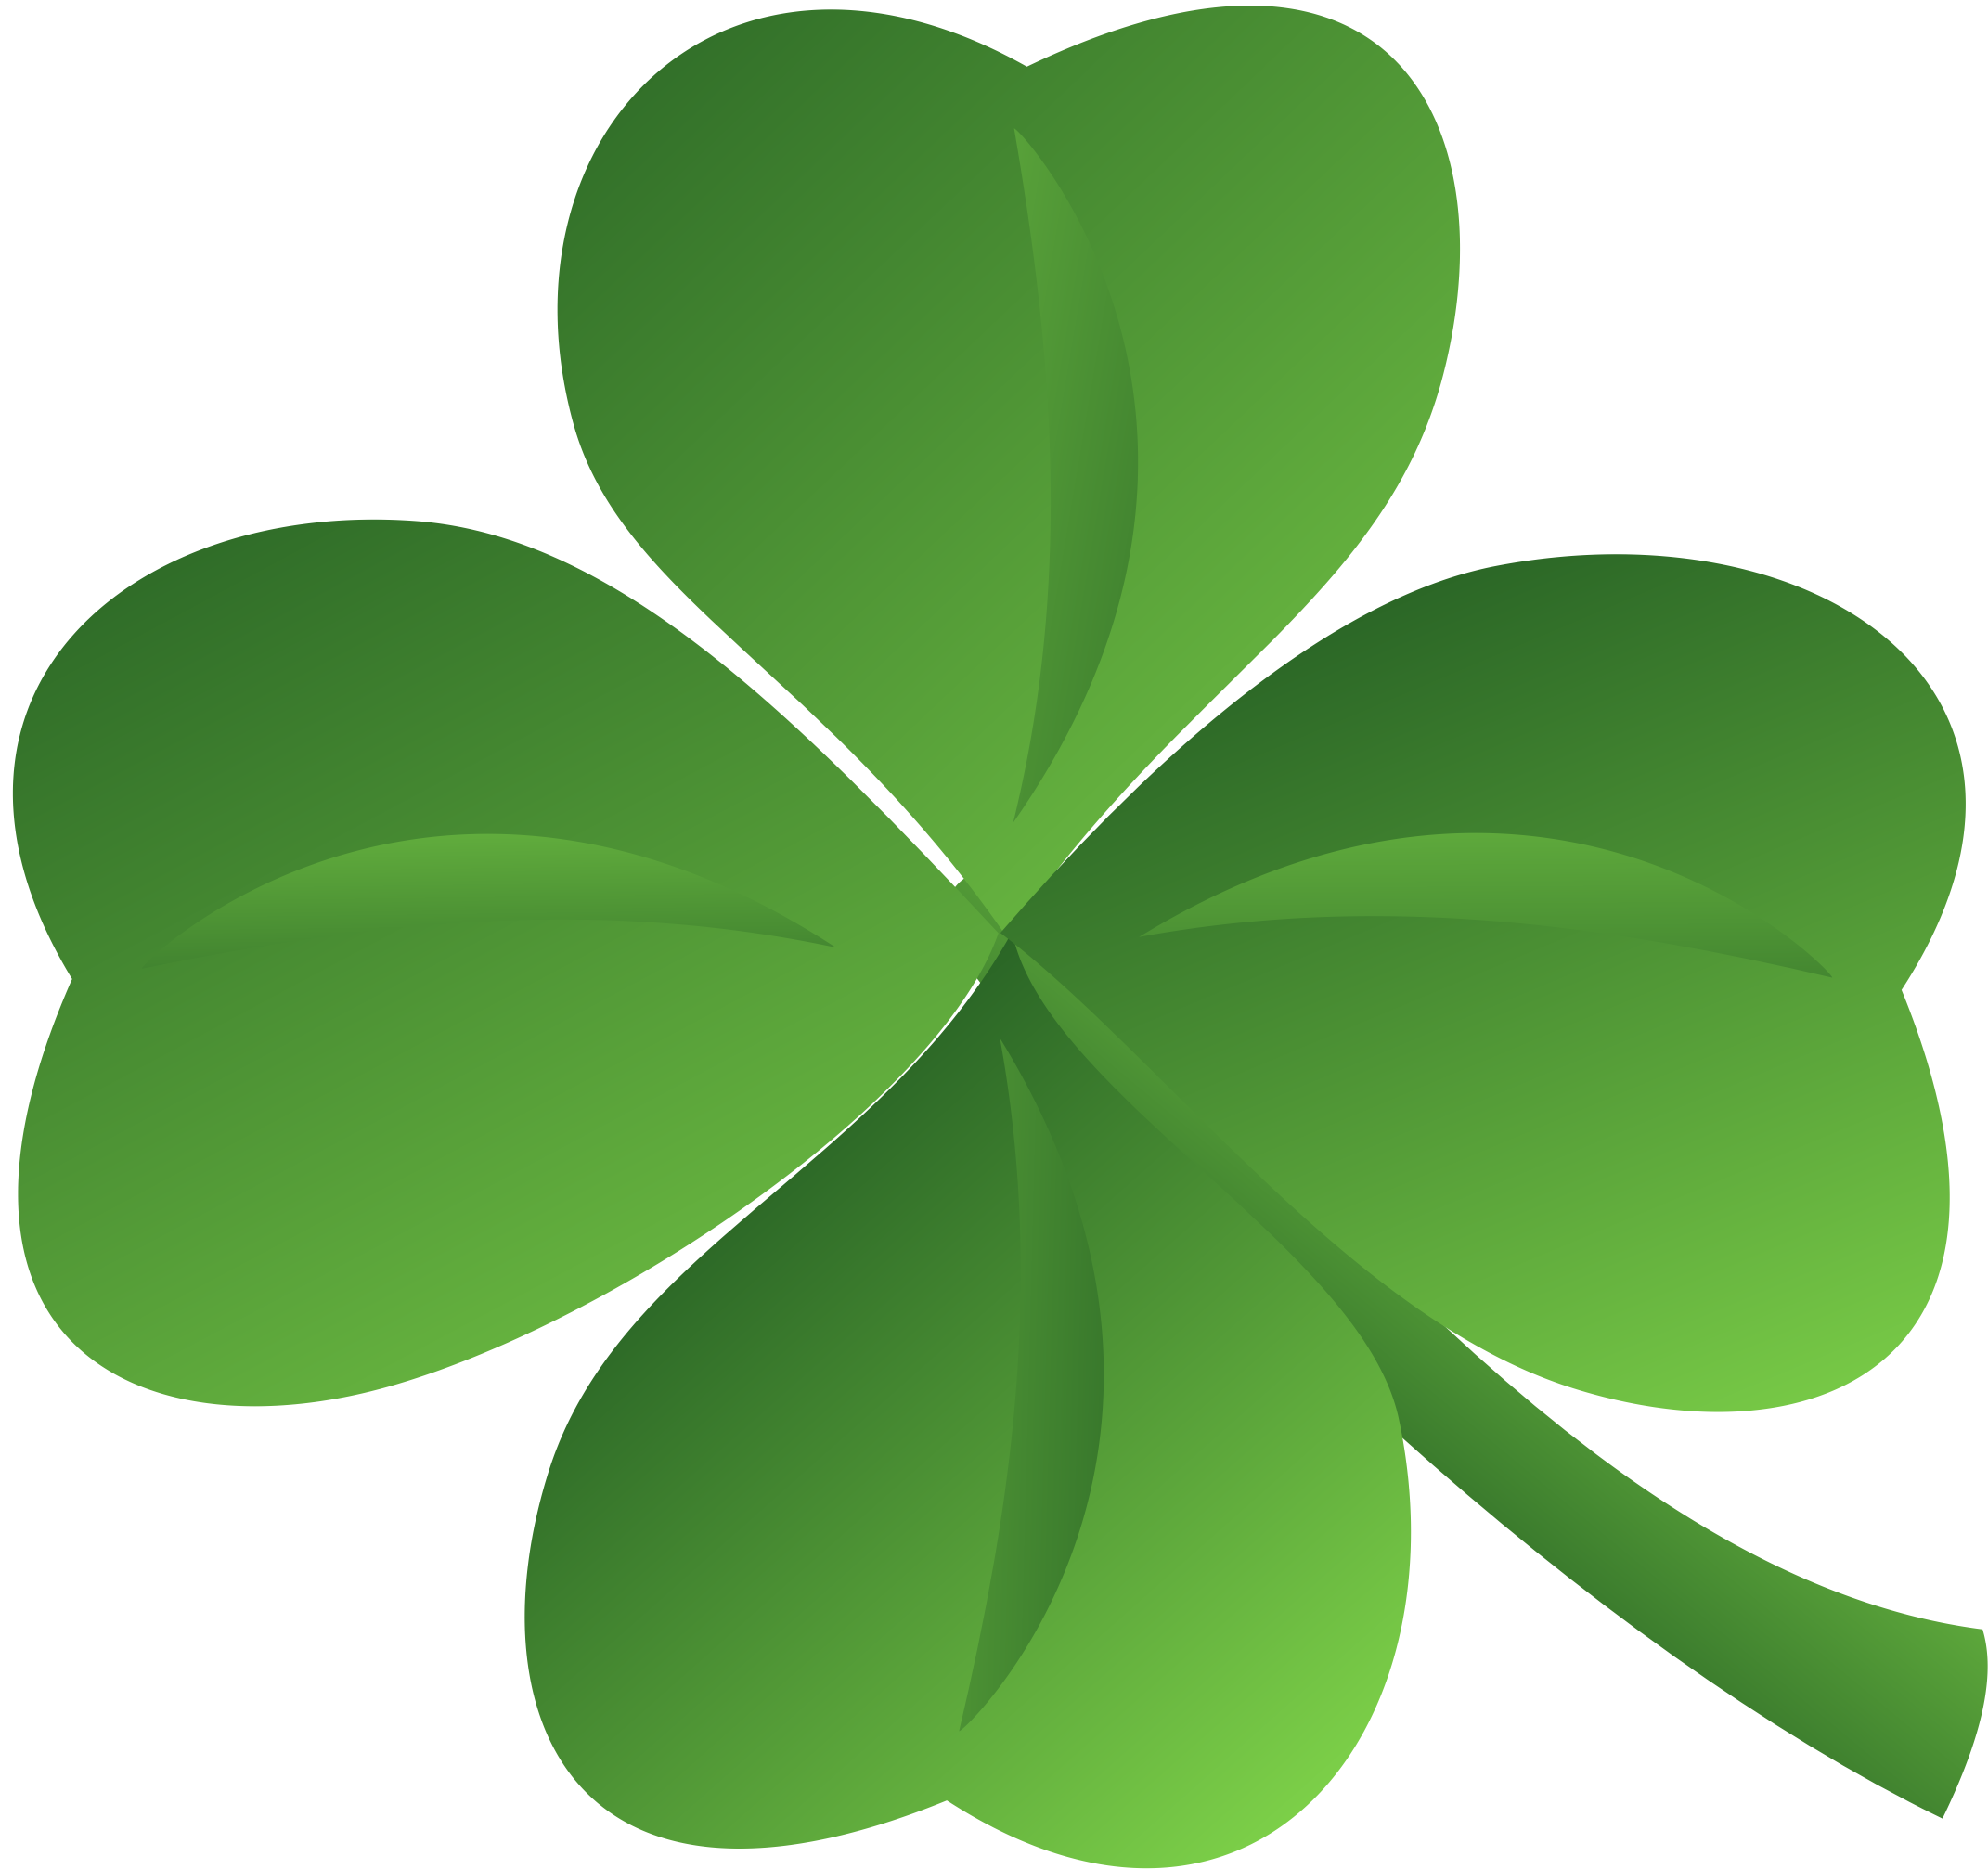 Clover Ns St Patricks Day Clipart Clover Leaf Clover